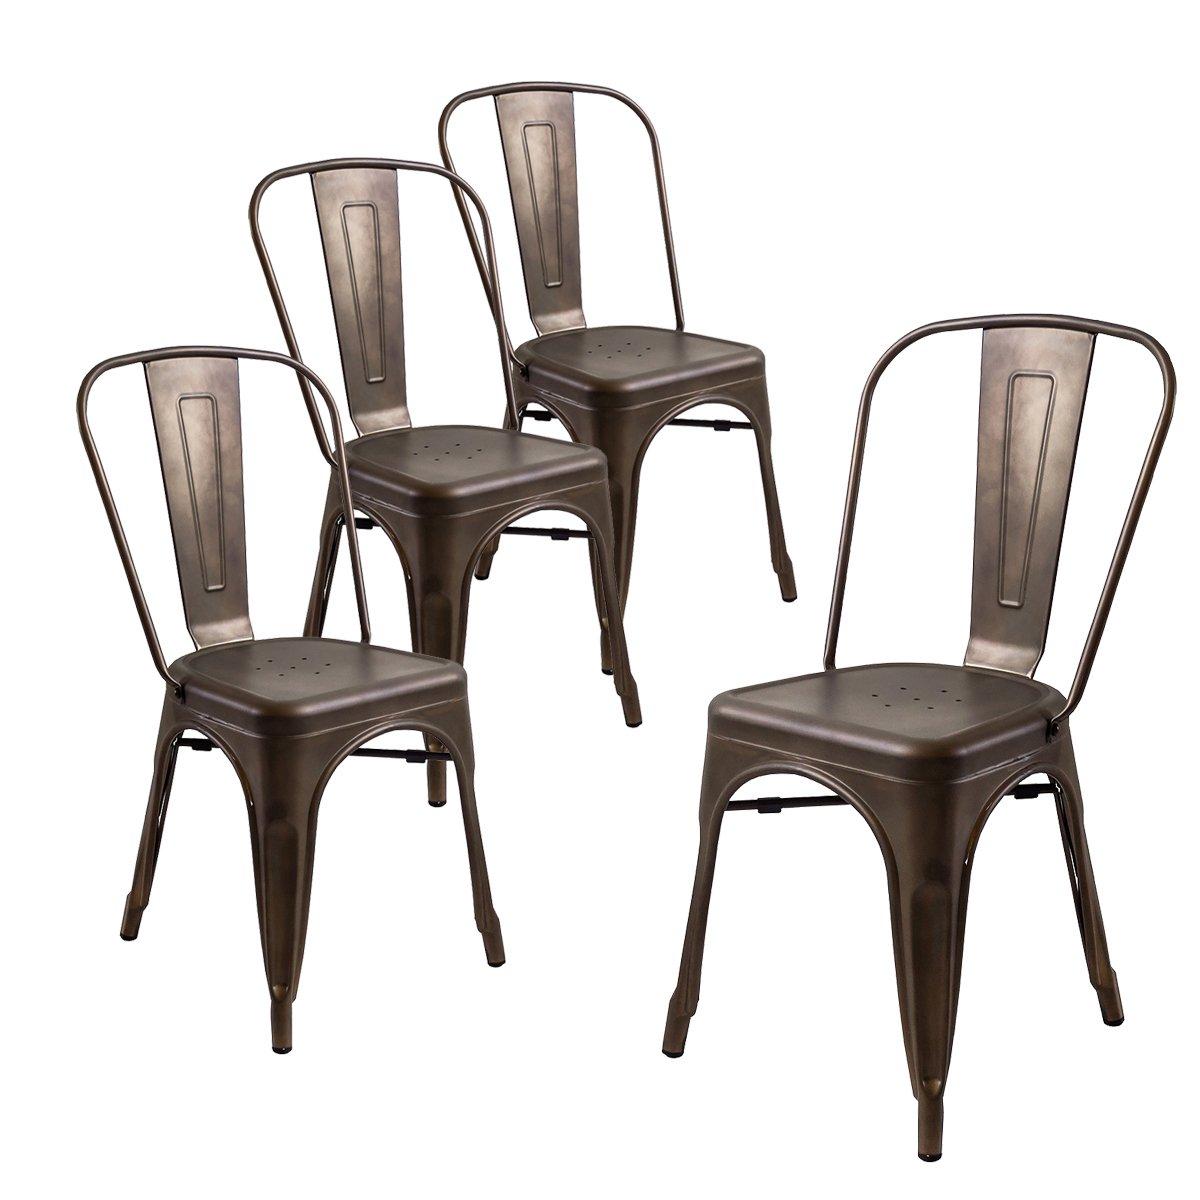 Buschman Store Tolix-Style Metal Indoor Outdoor Stackable Dinning Chairs with Back , Set of 4 , Bronze